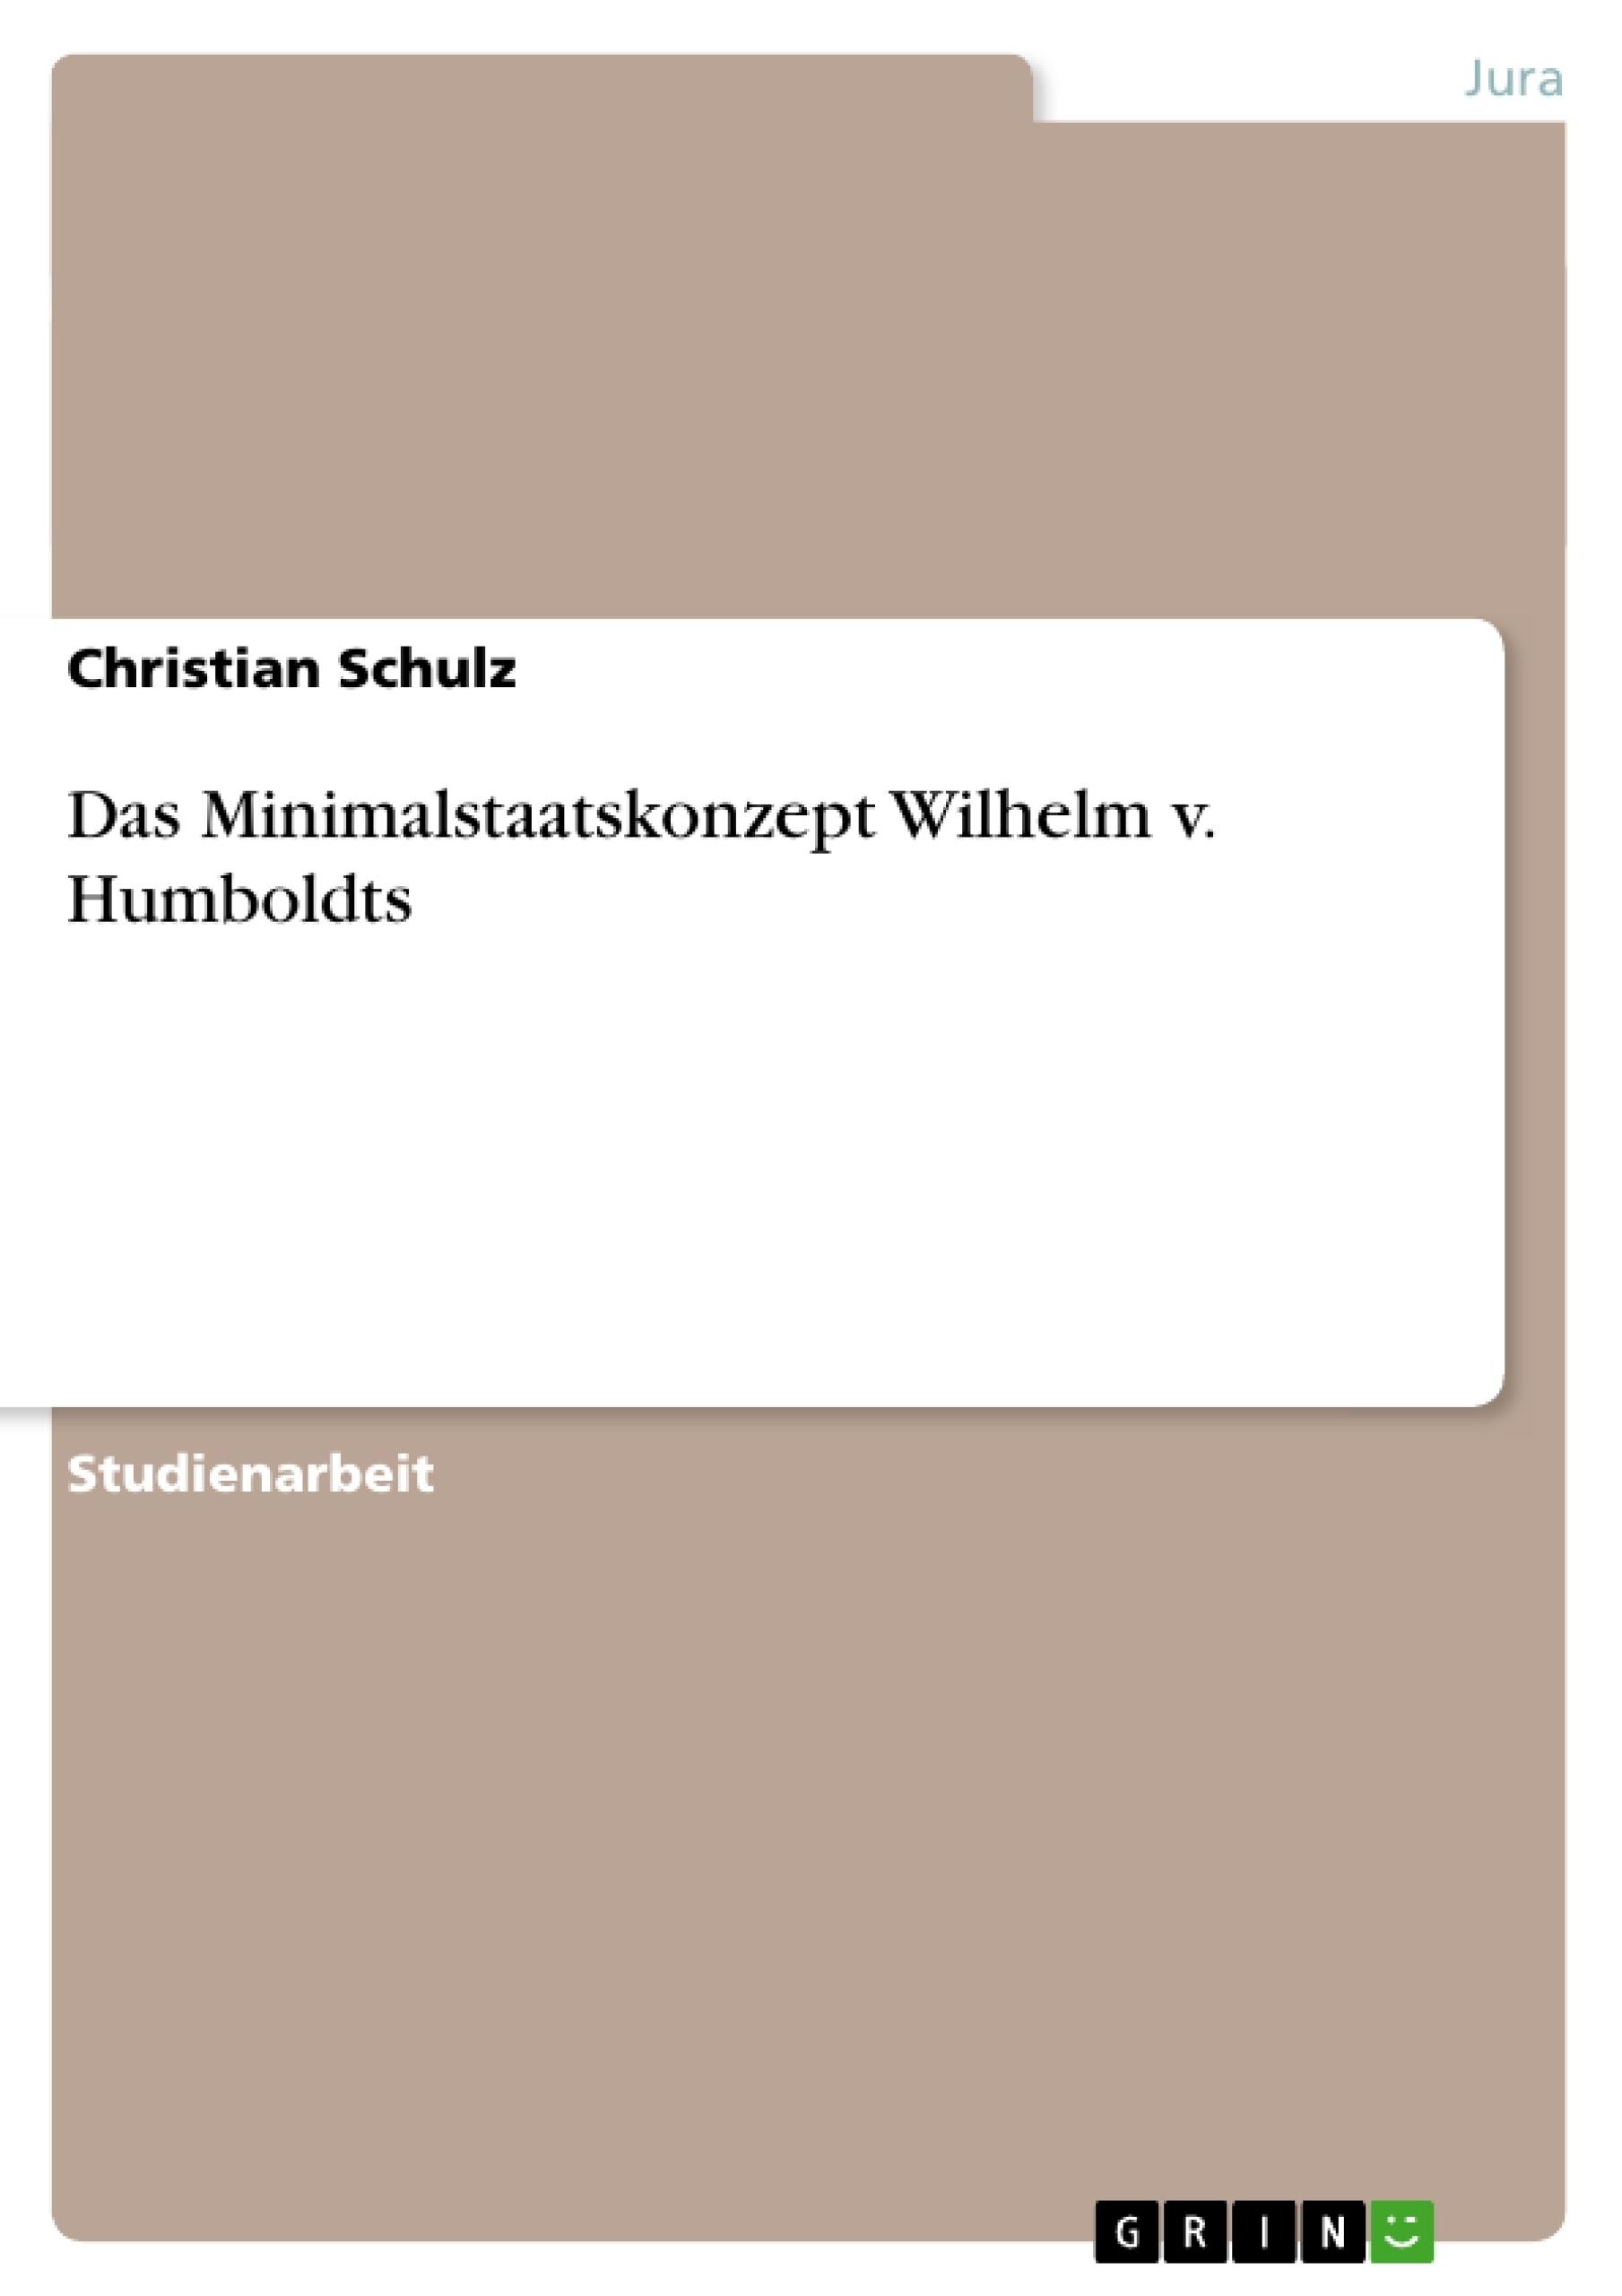 Titel: Das Minimalstaatskonzept Wilhelm v. Humboldts